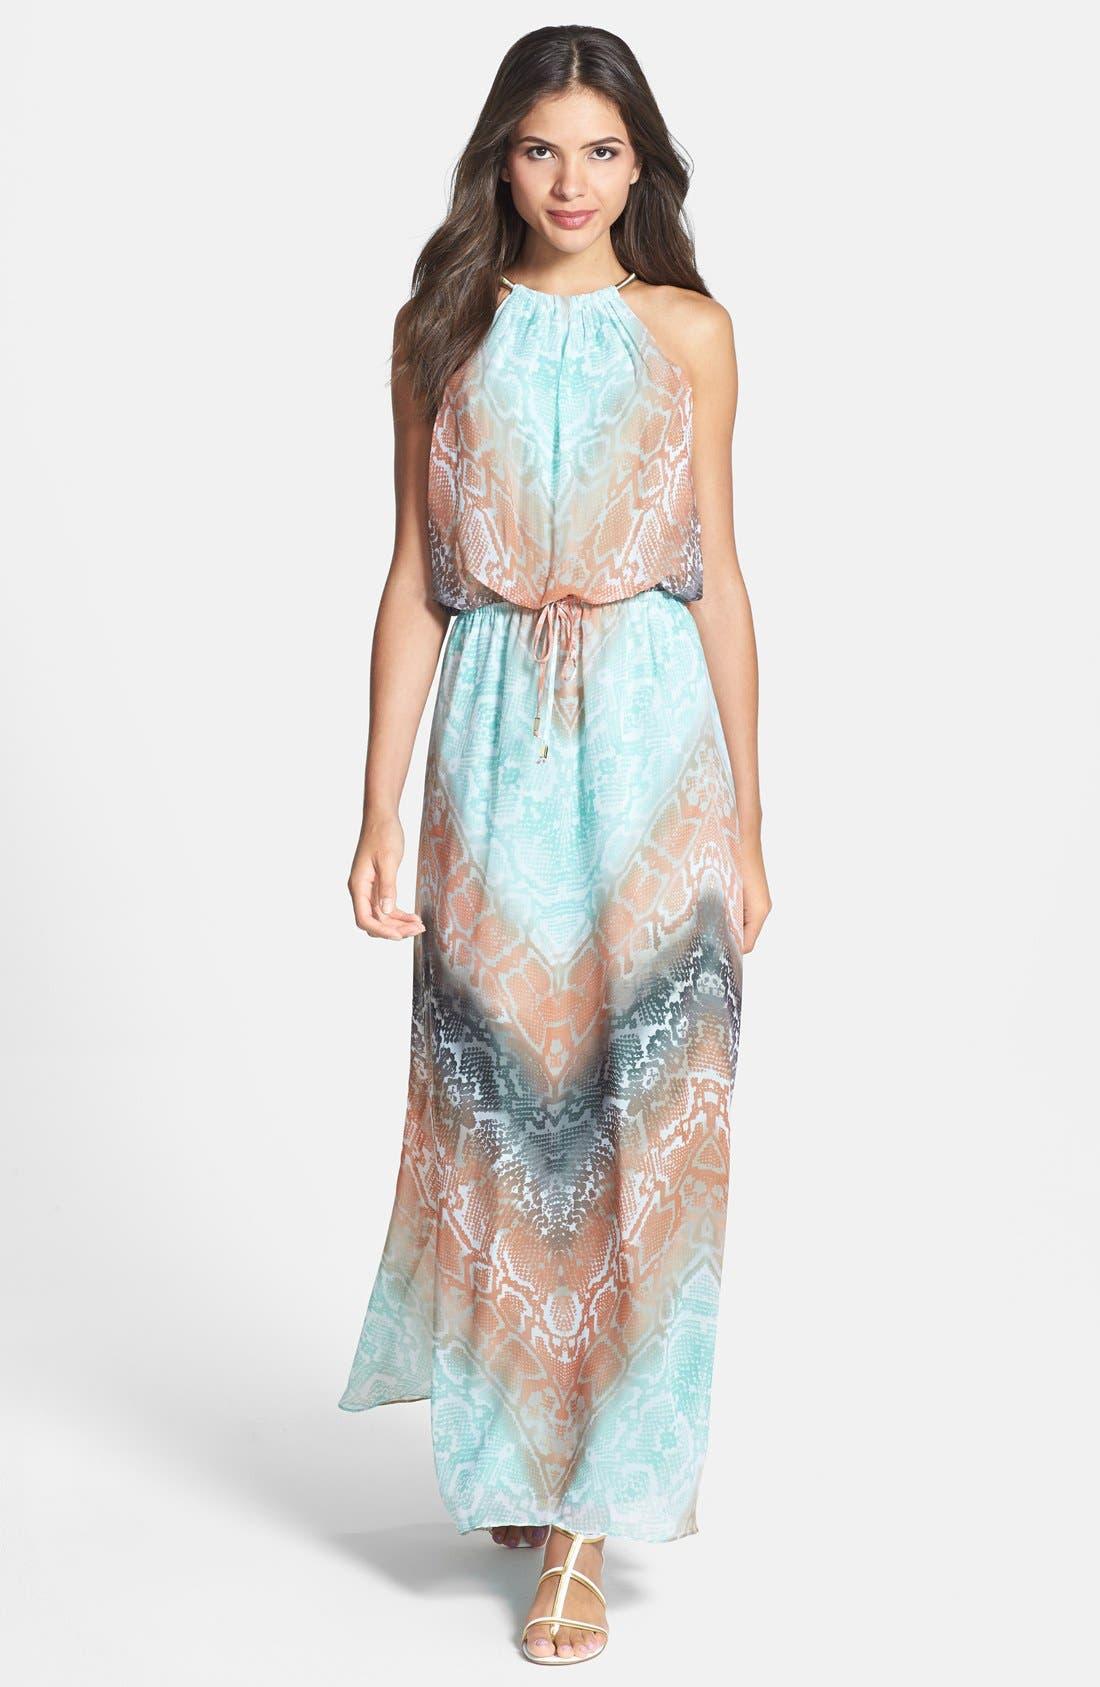 Main Image - Vince Camuto Print Chiffon Blouson Maxi Dress